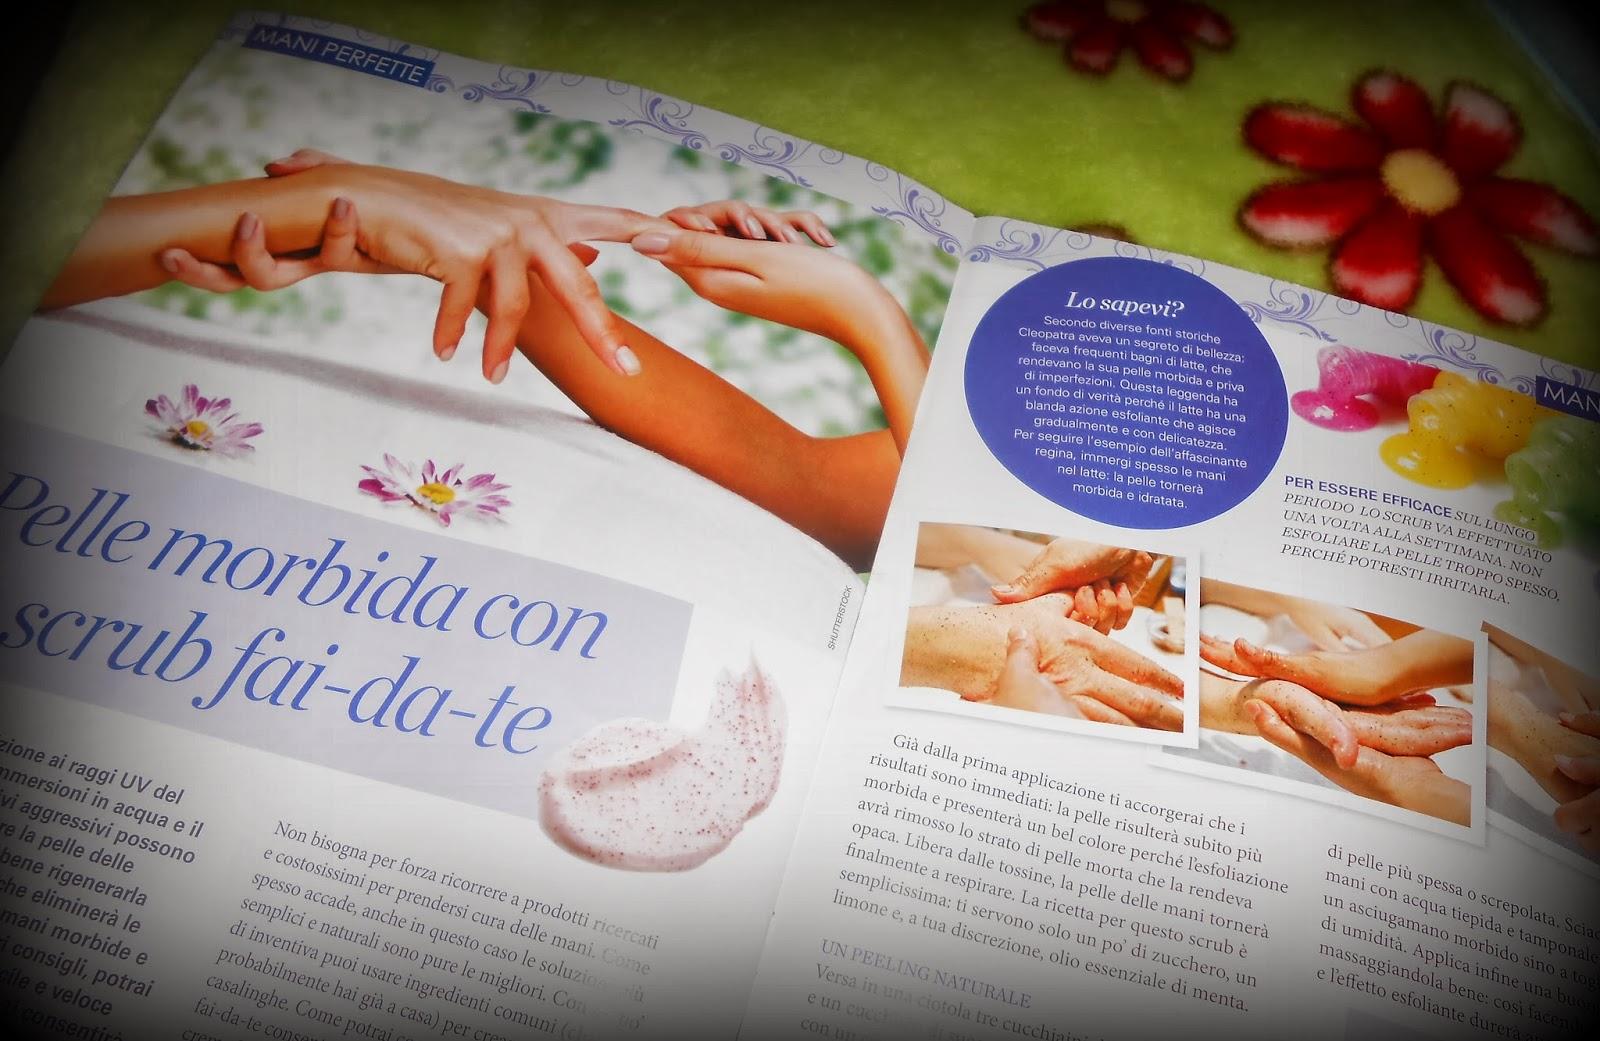 My Passion Is Nail Art: Anteprima 2a uscita rivista My Nail Design!